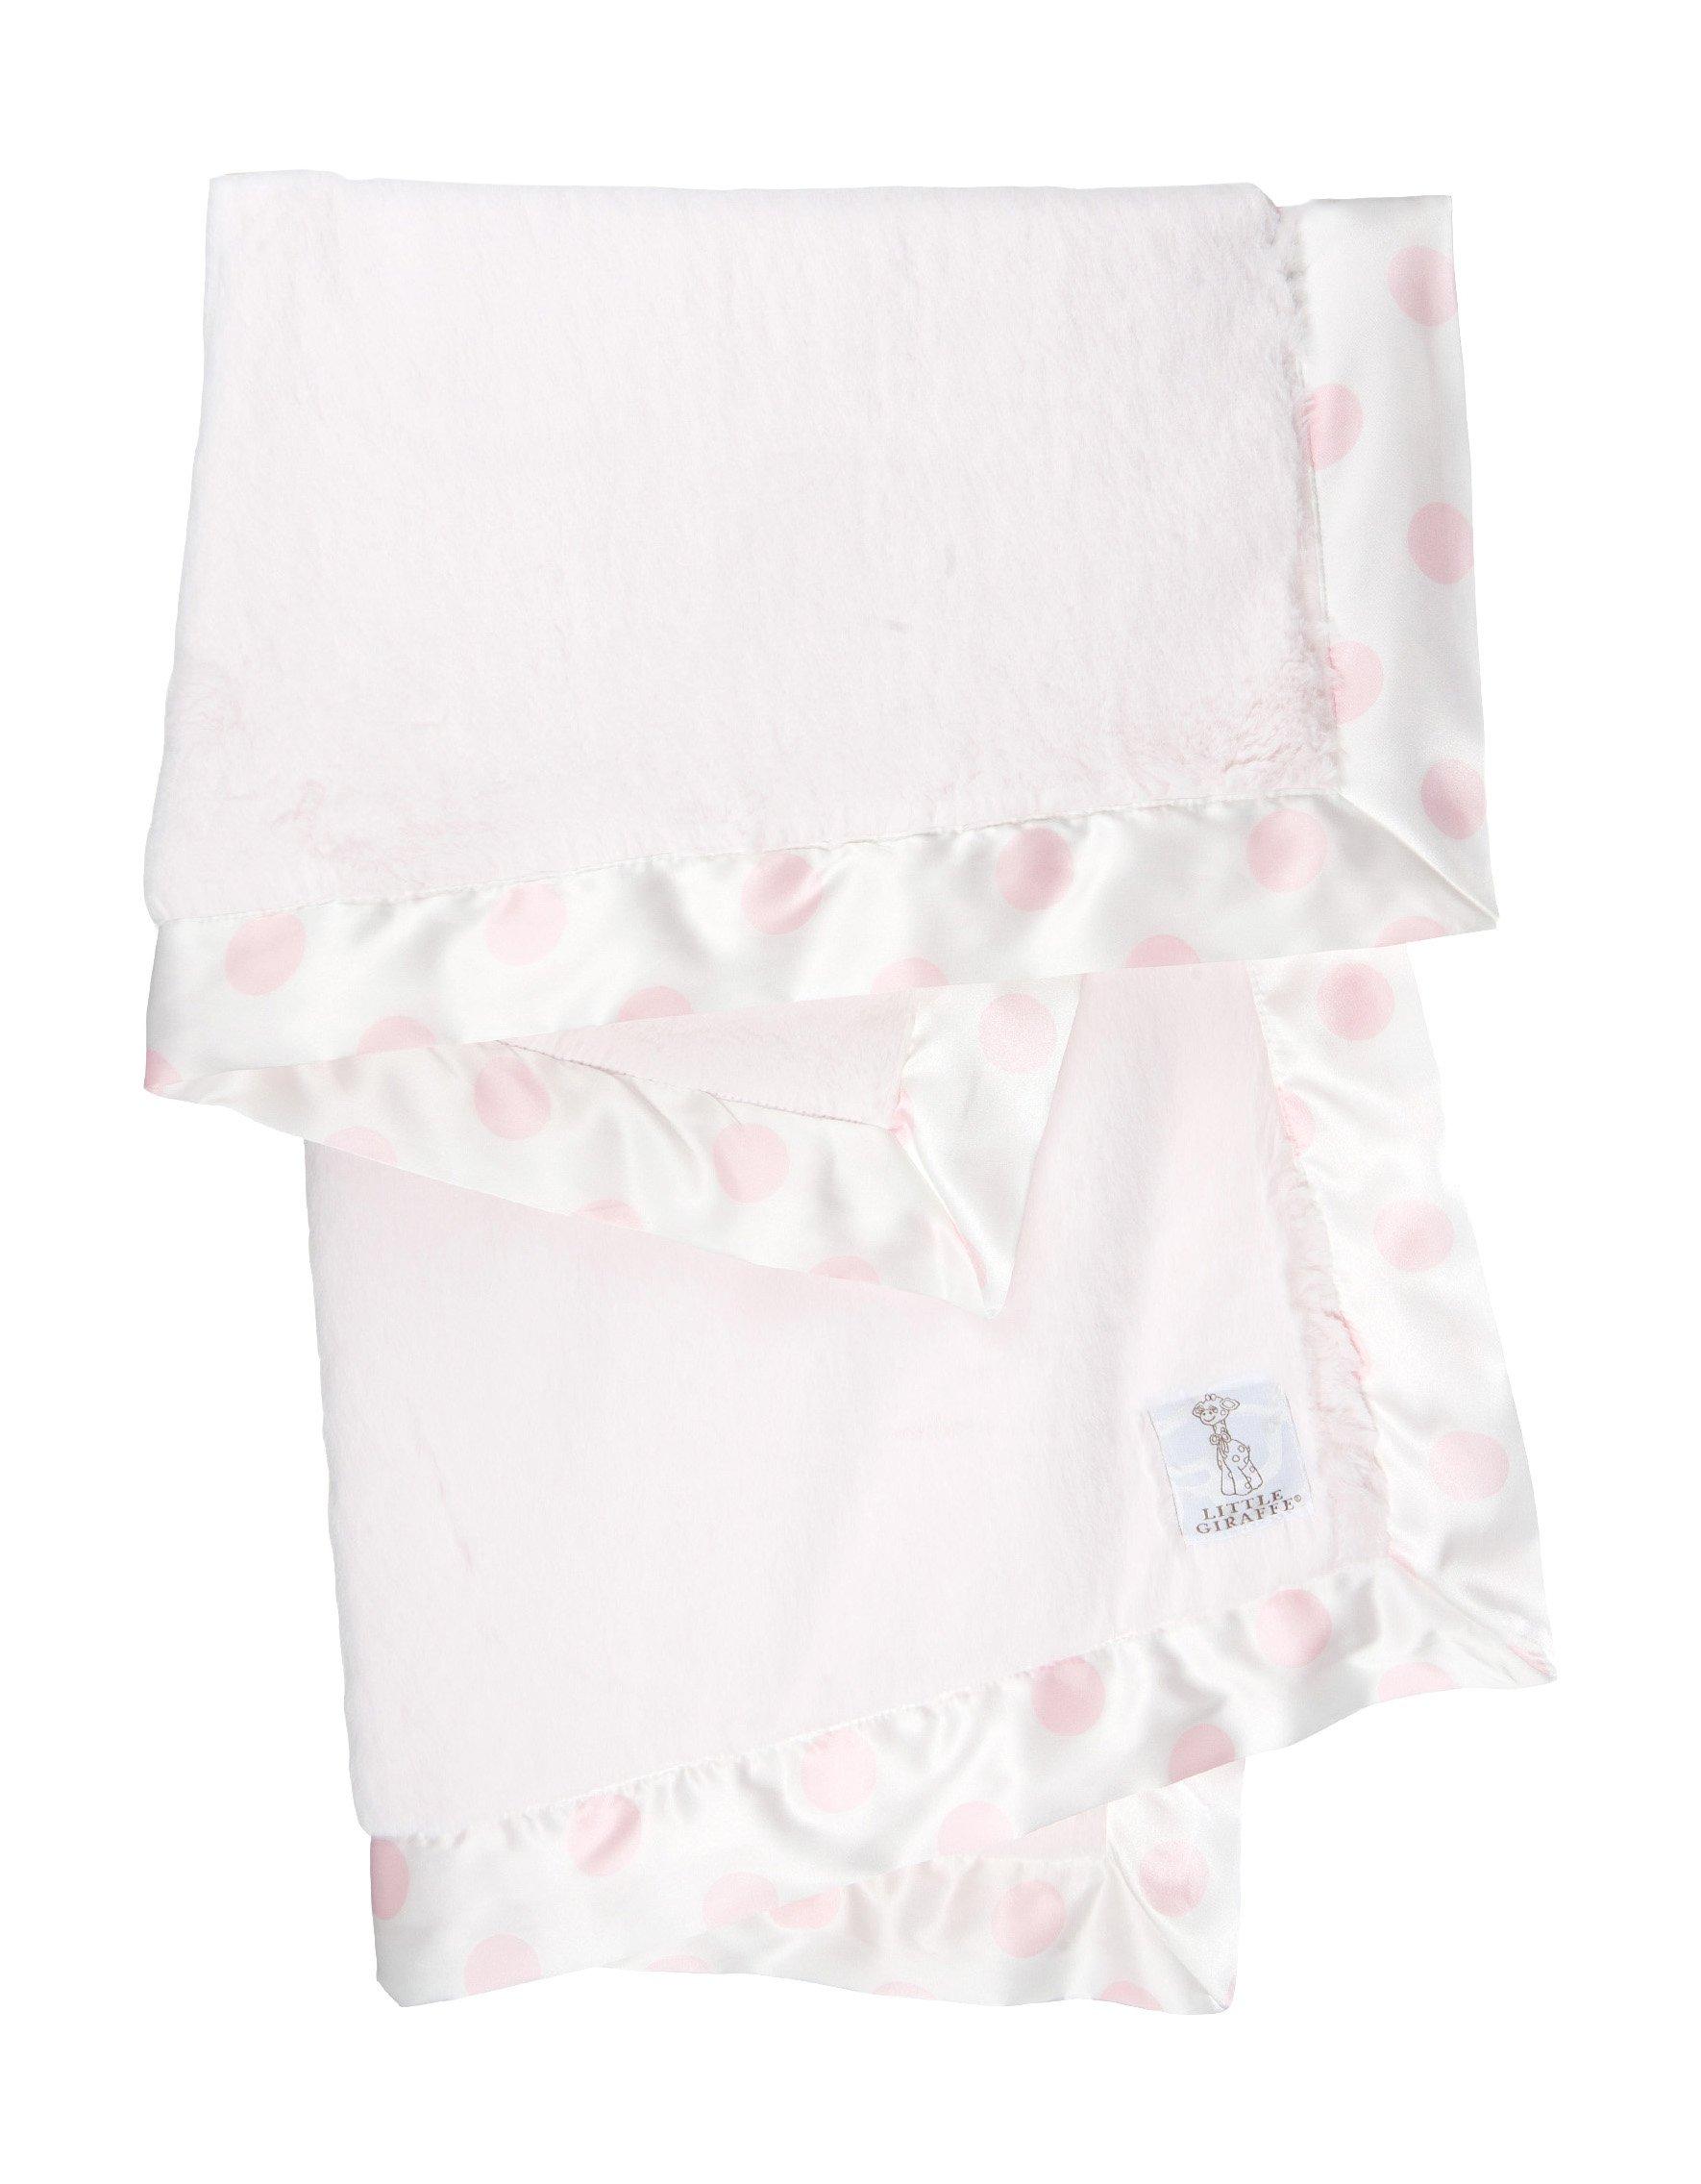 Luxe Dot Baby Blanket